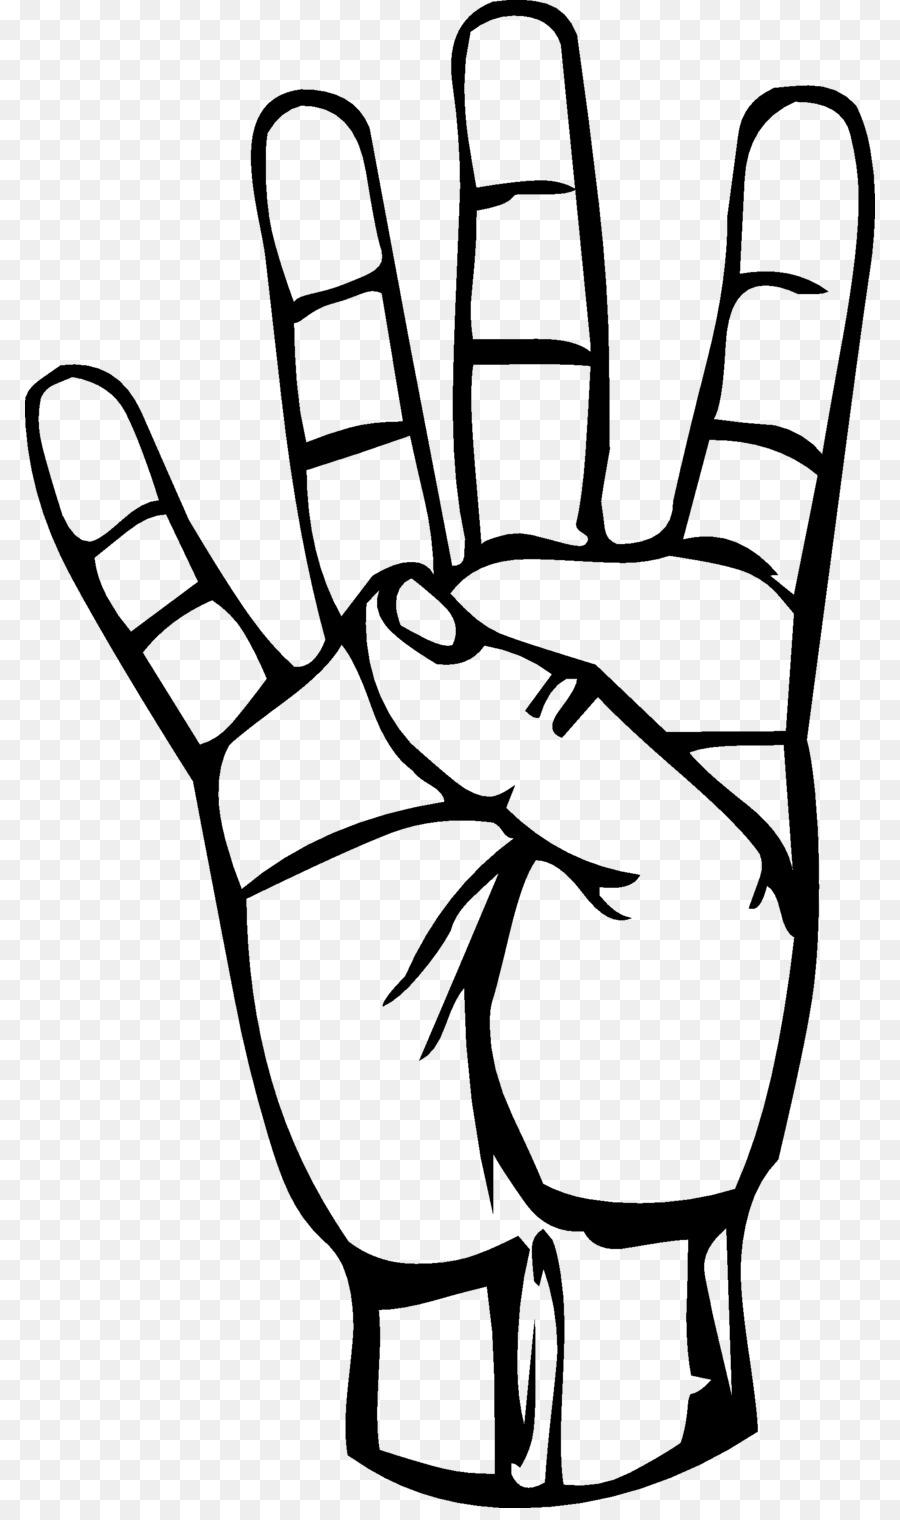 Lenguaje americano de Señas lenguaje de señas para bebés de corea ...